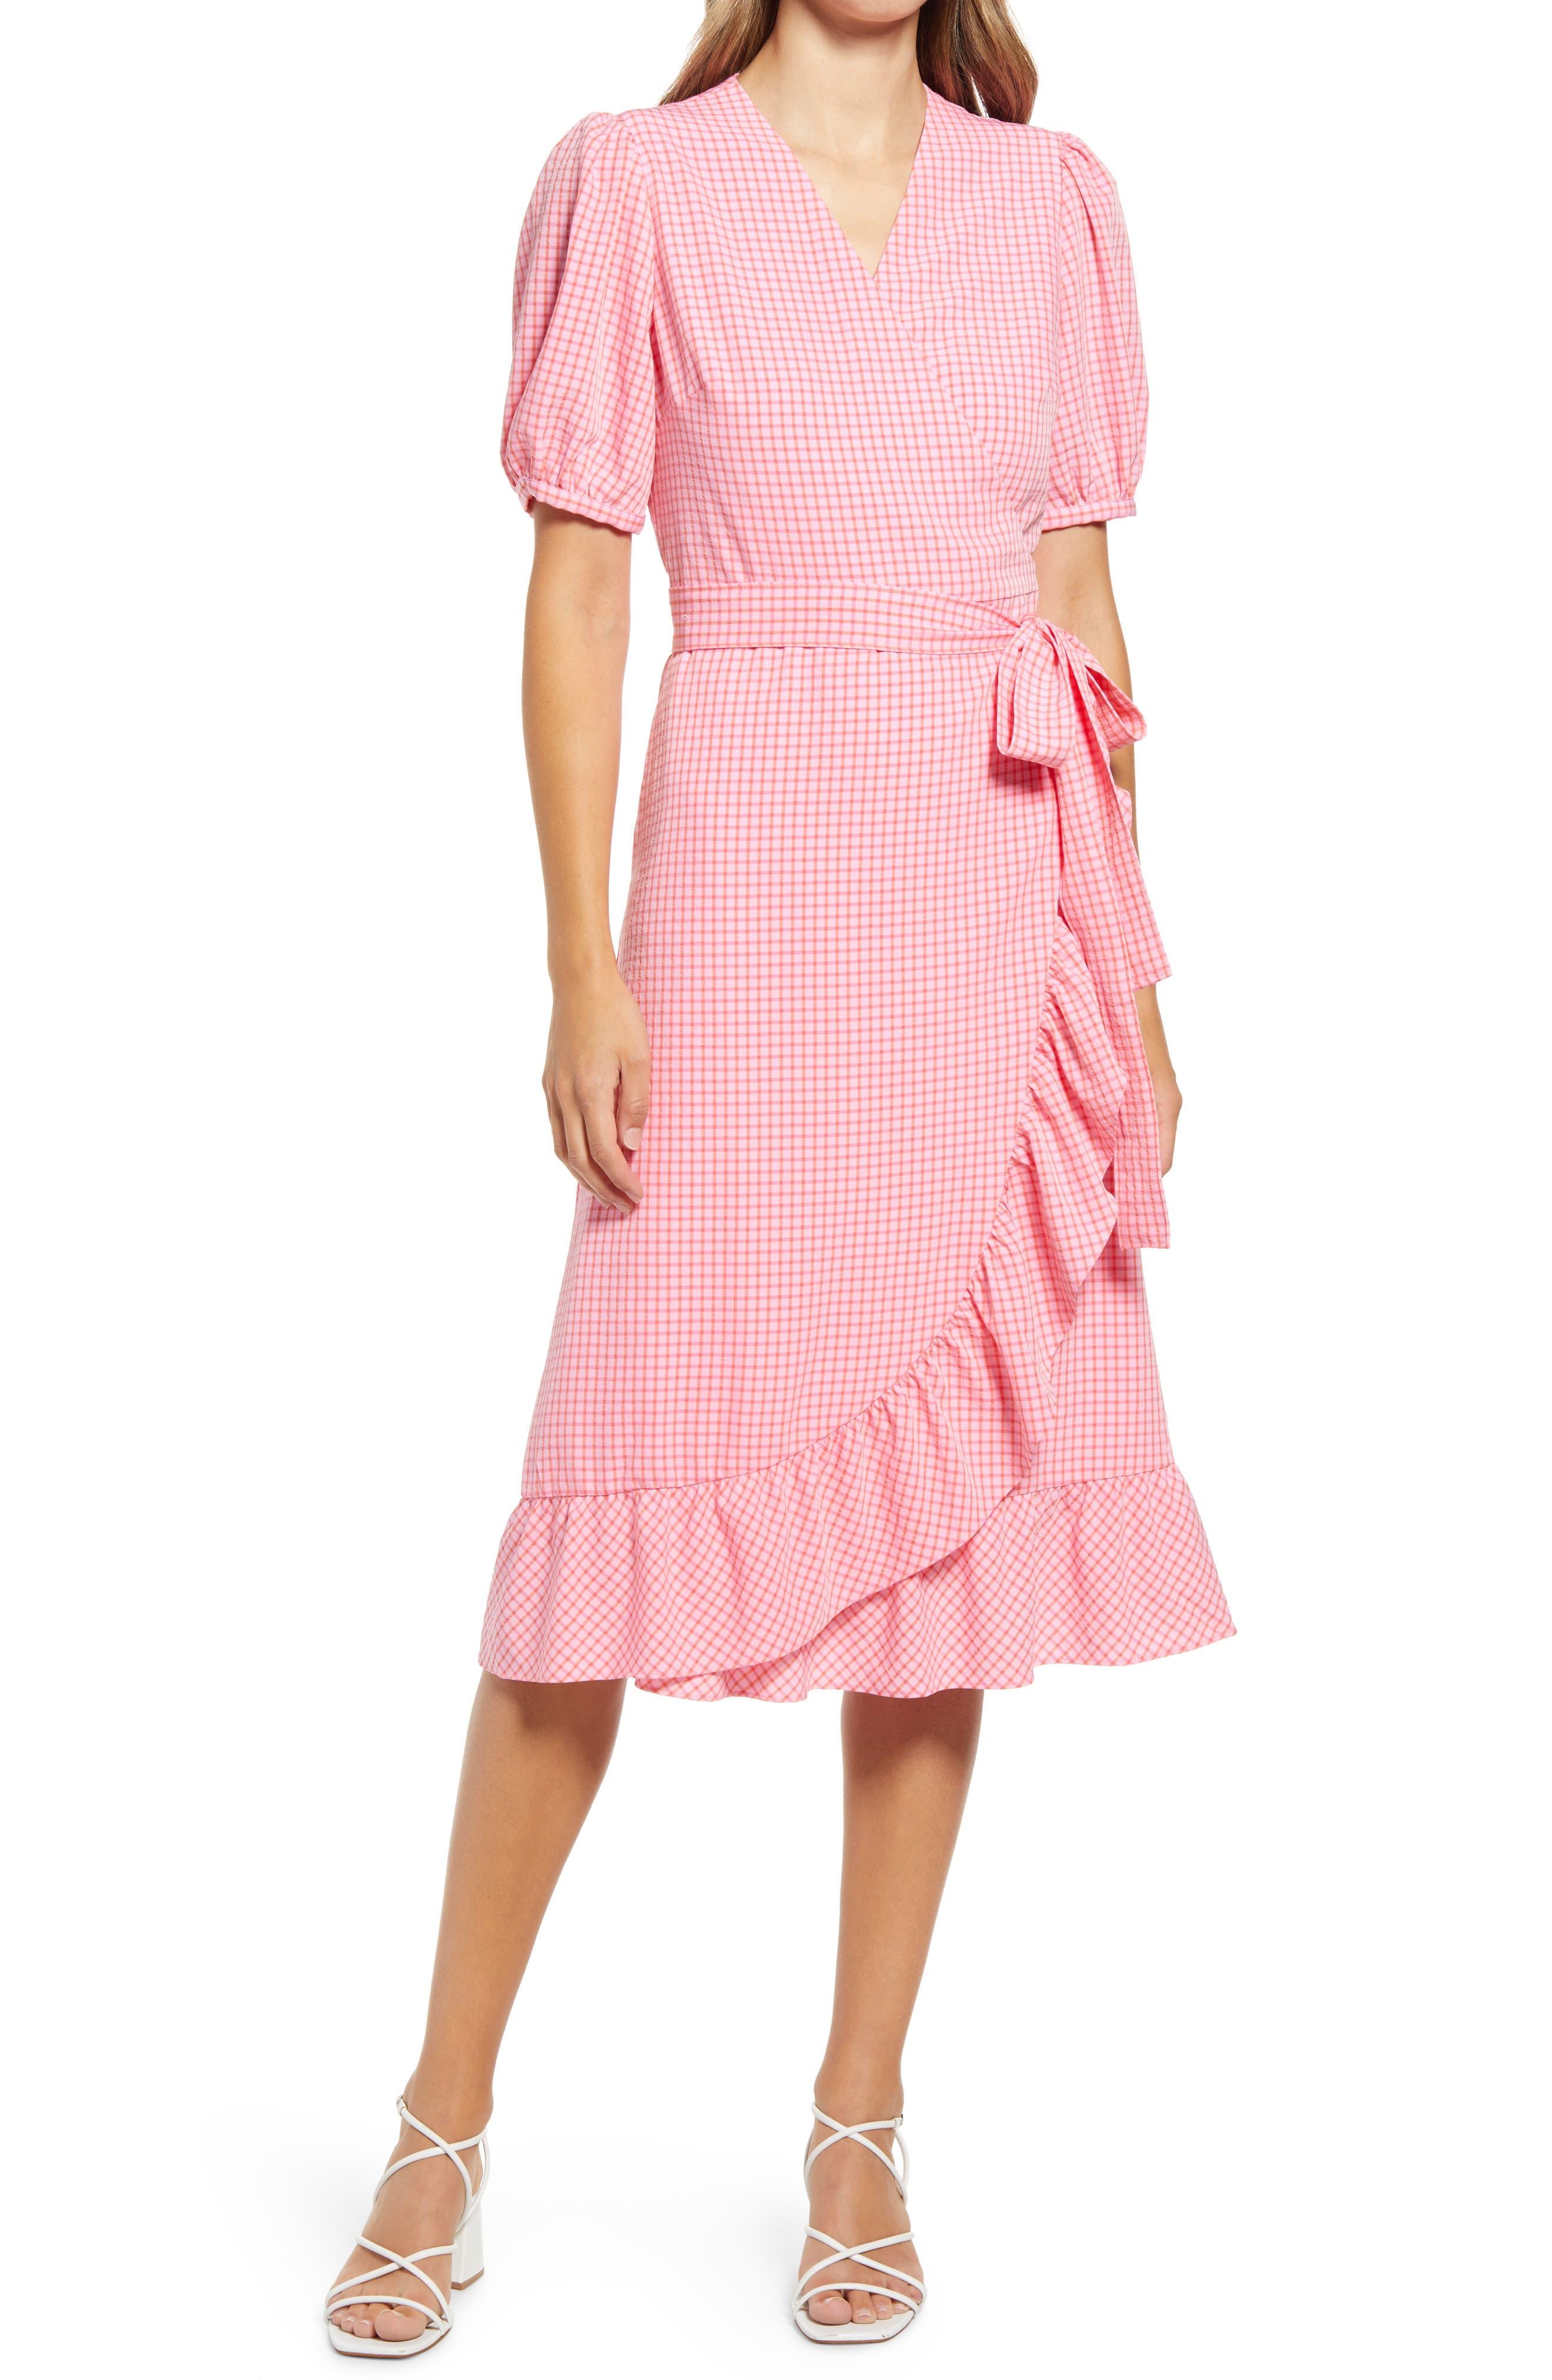 Reba Gingham Seersucker Wrap Dress